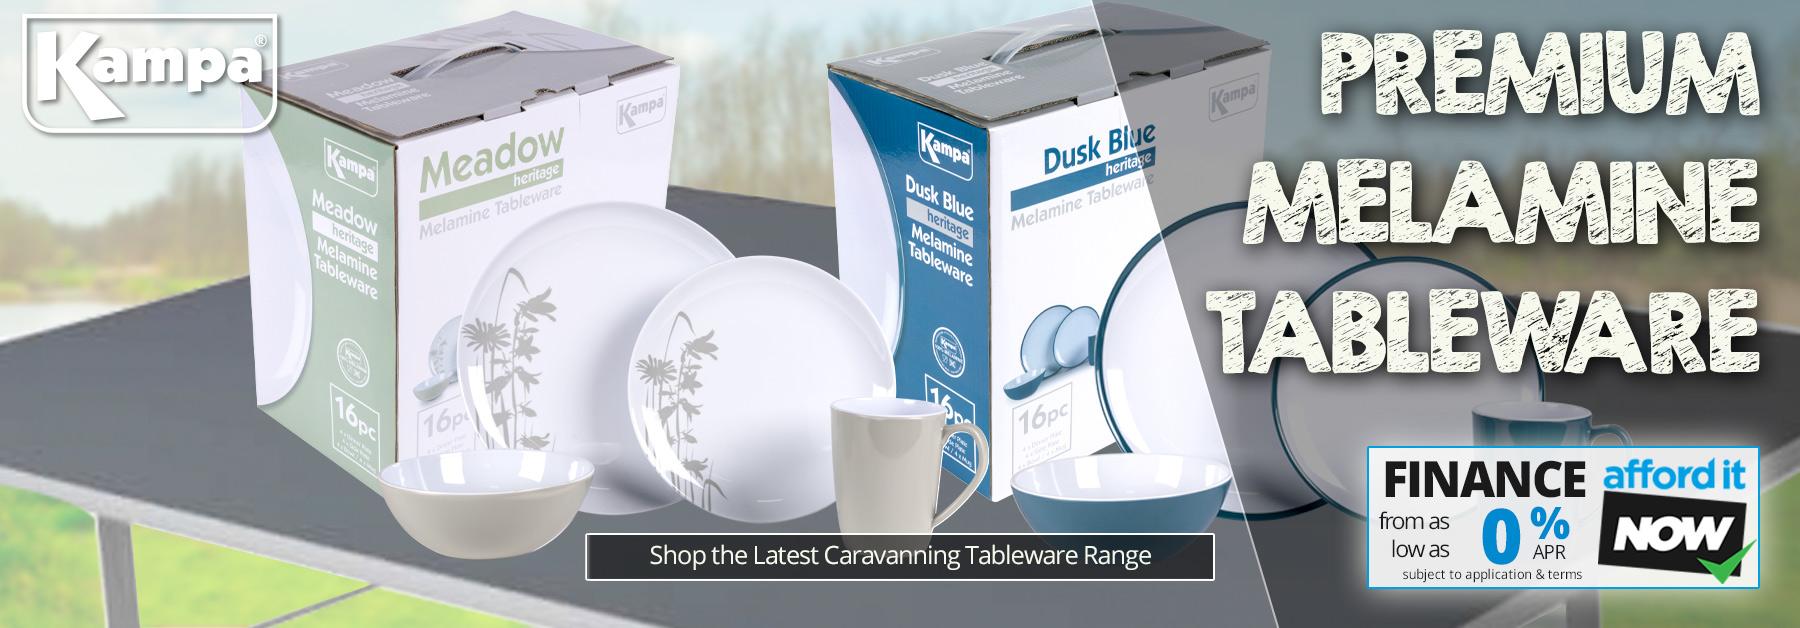 New 2020 Kampa Melamine Tableware